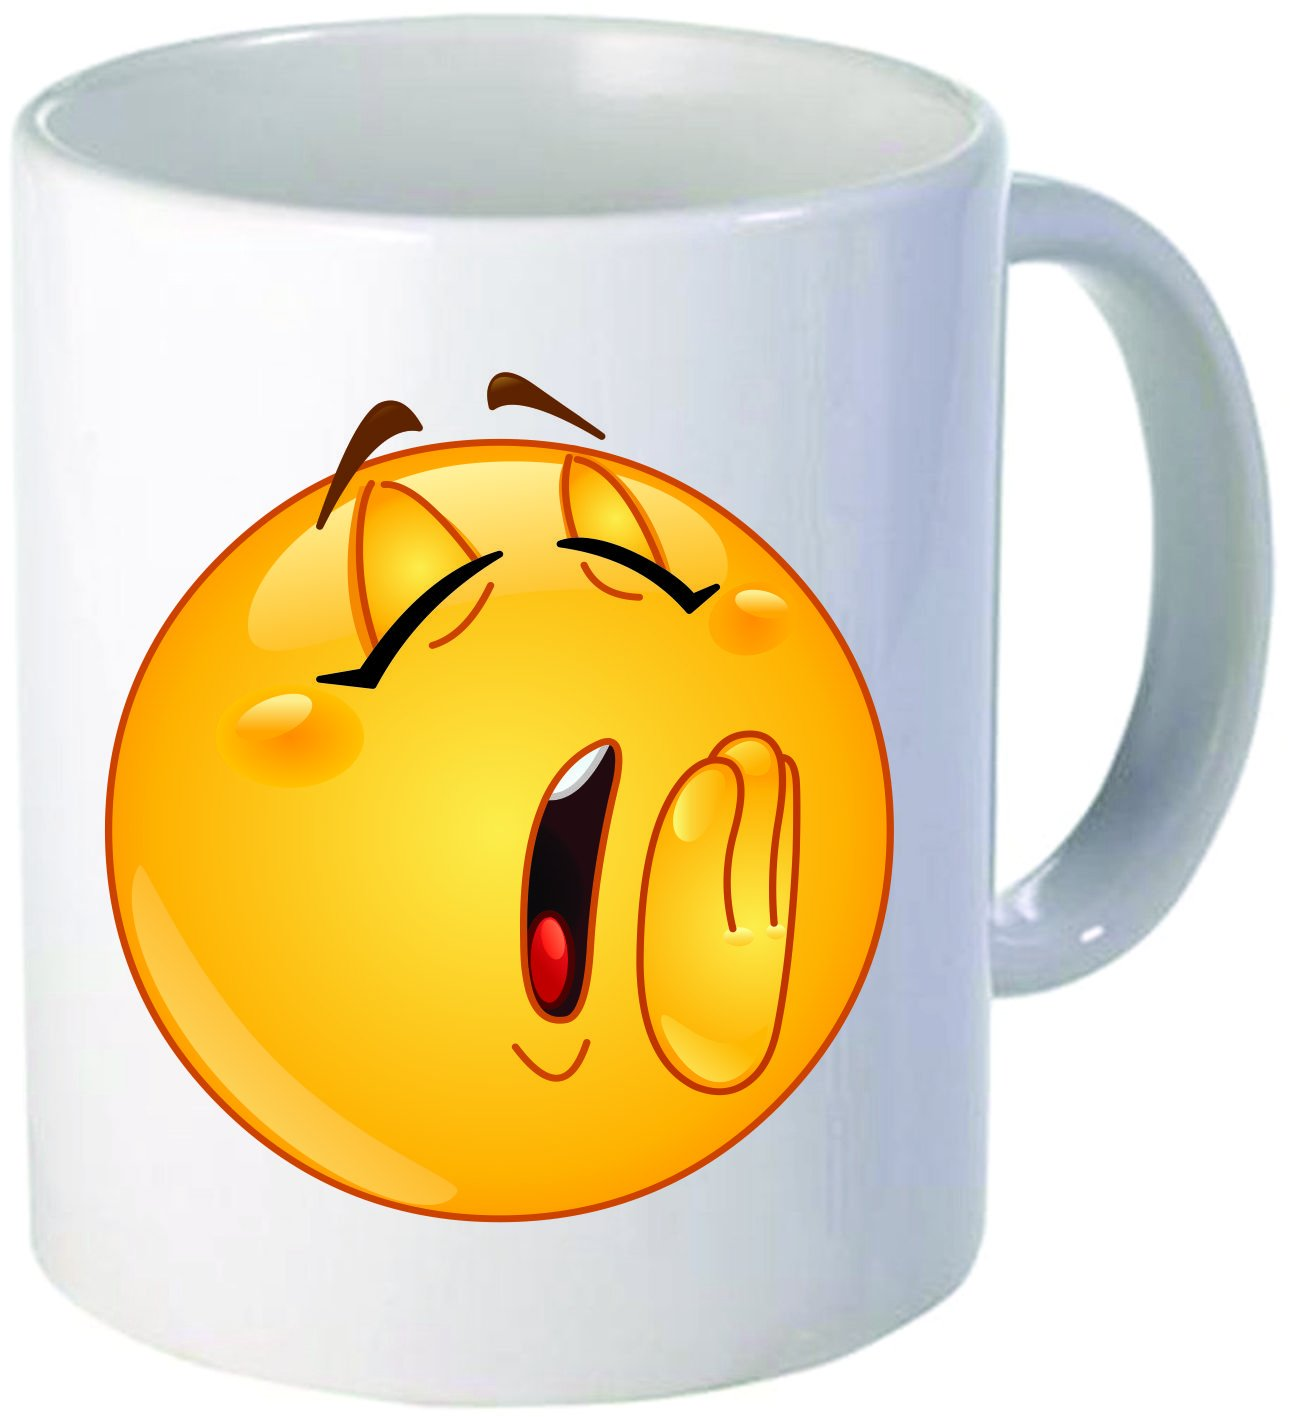 Smiley Face Coffee Mug Amazoncom Funny Coffee Mug 11oz Ceramic Emoji Sleepy Face